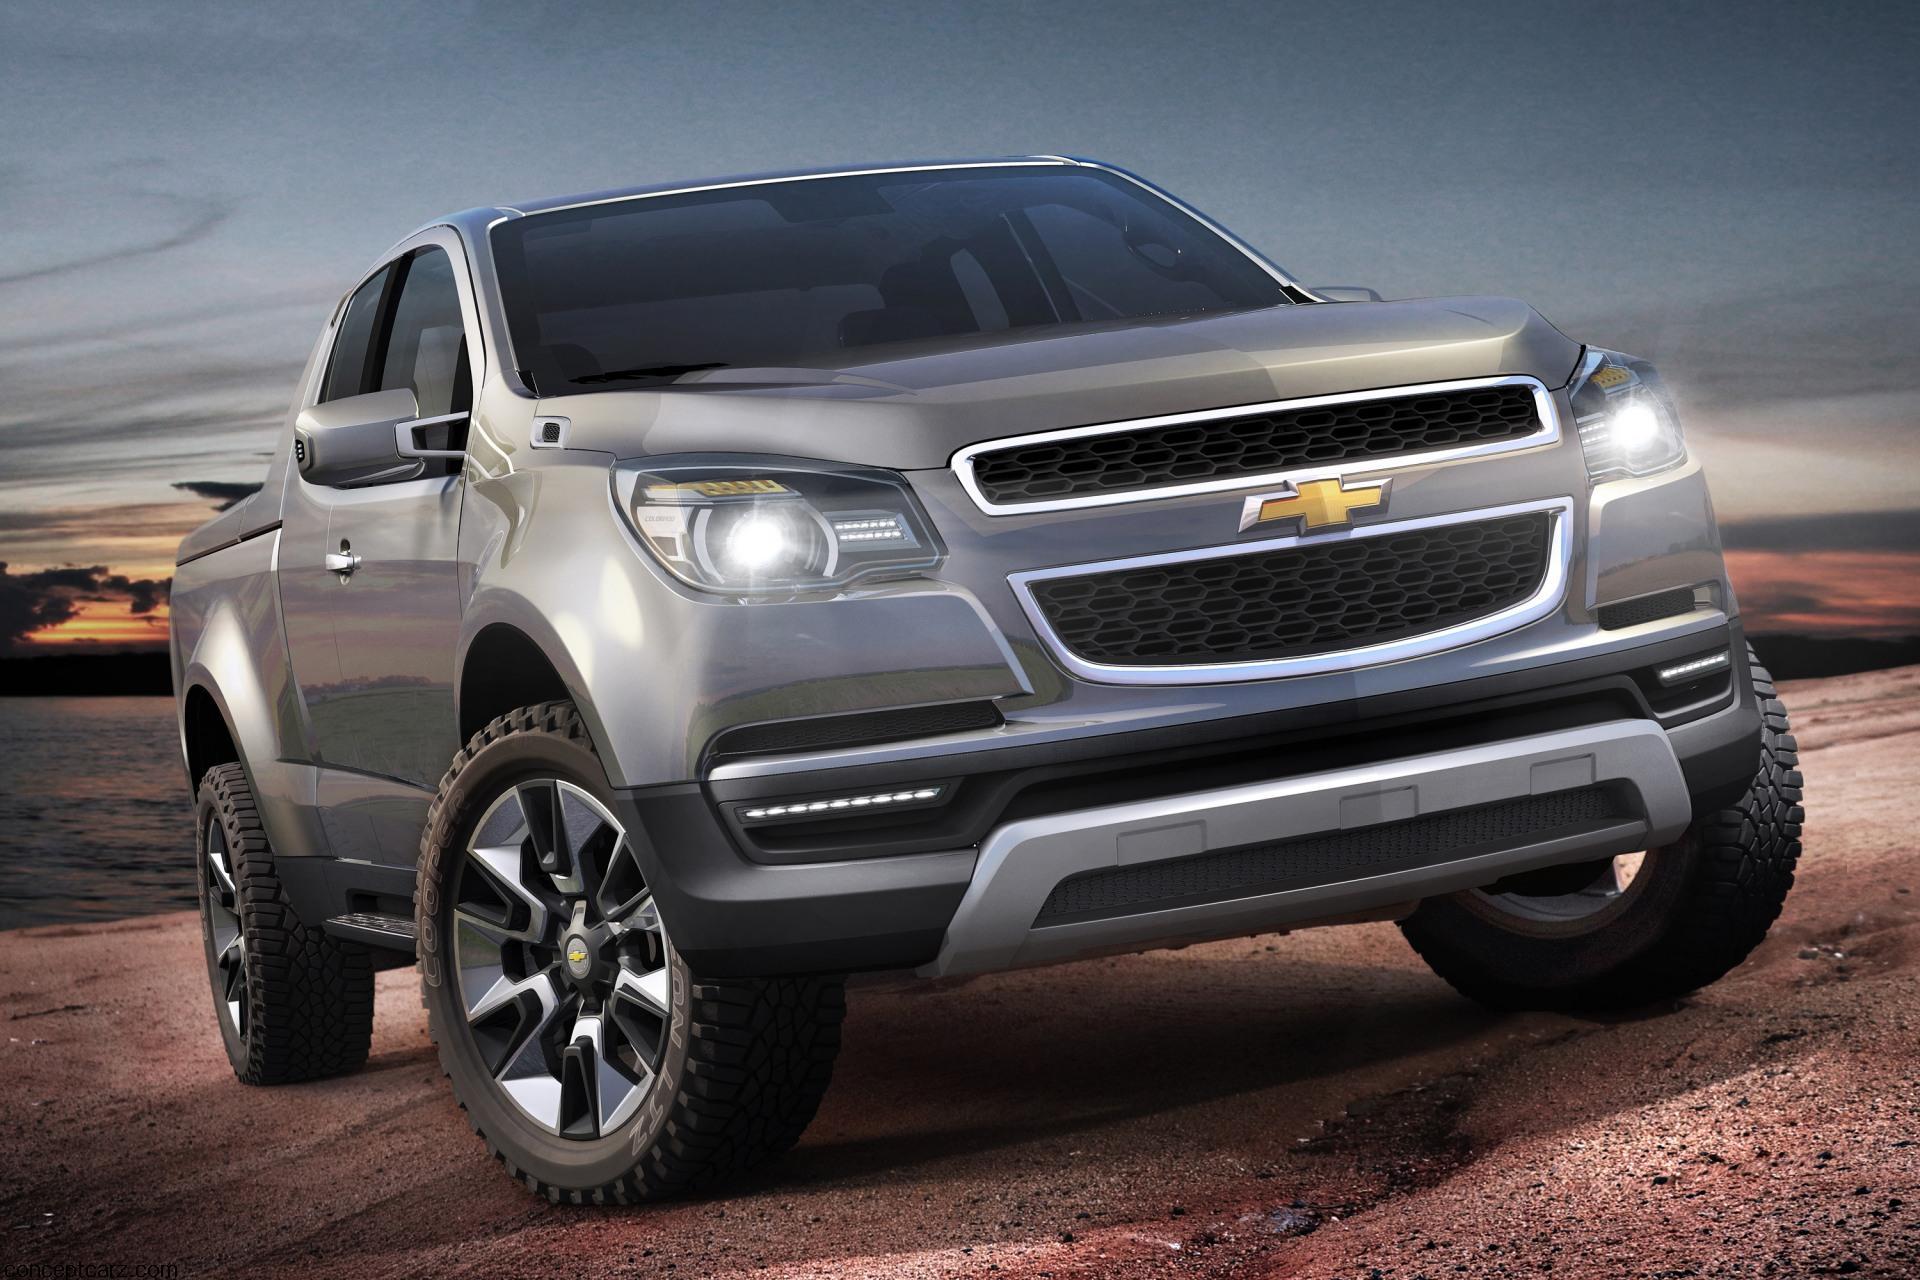 2011 Chevrolet Colorado Show Truck